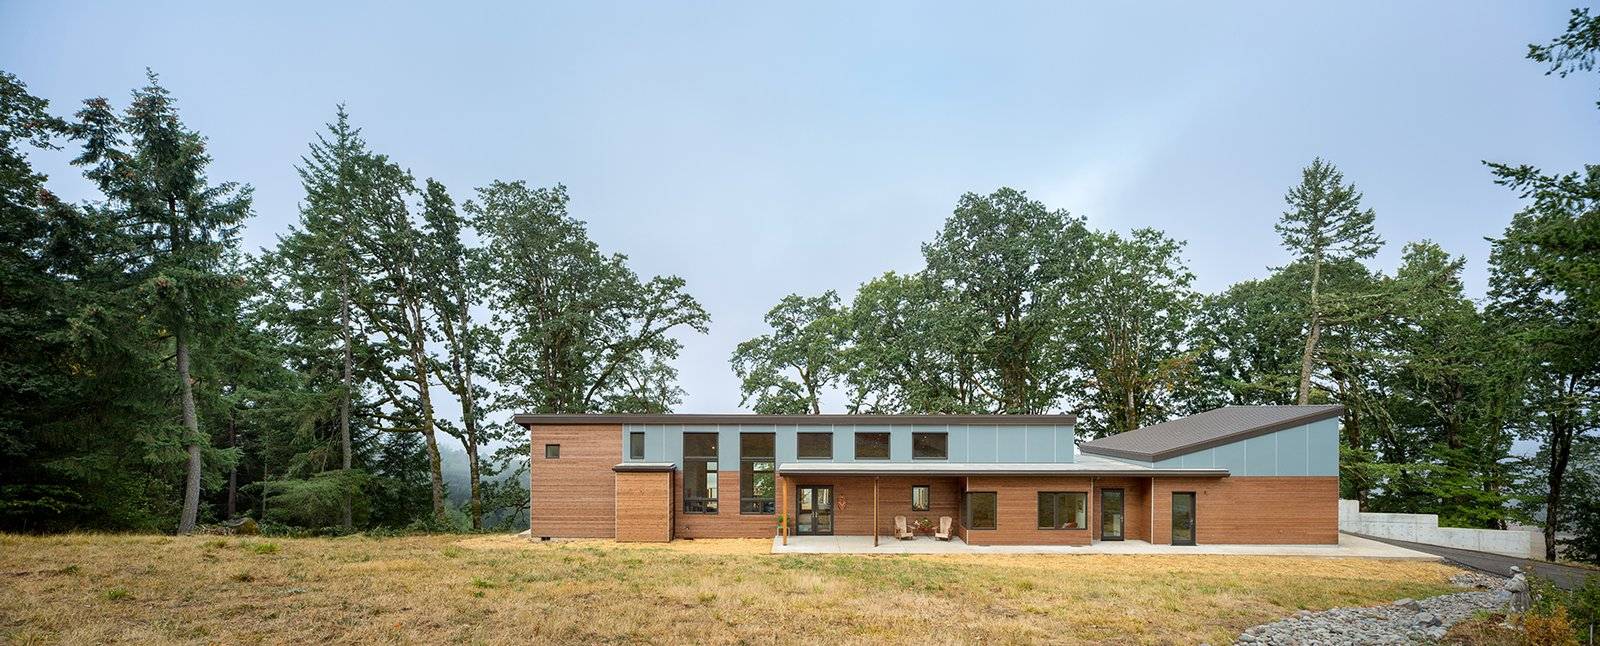 Fullsize Of Farmhouse Ranch Style Homes